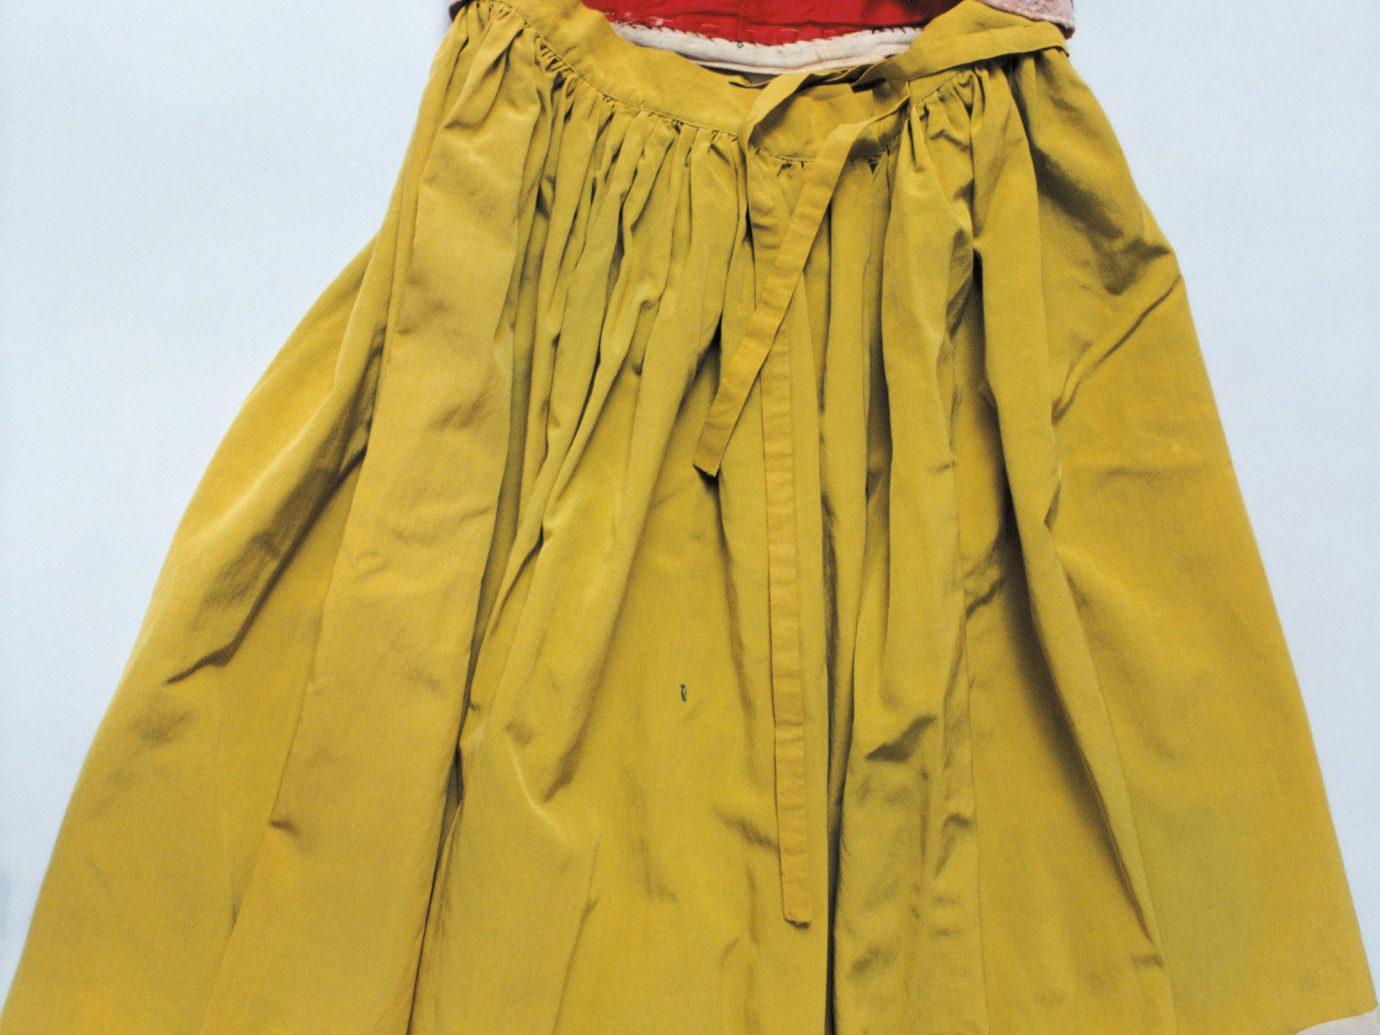 Arts + Culture clothing yellow skirt dress abdomen Design pattern jacket trunk